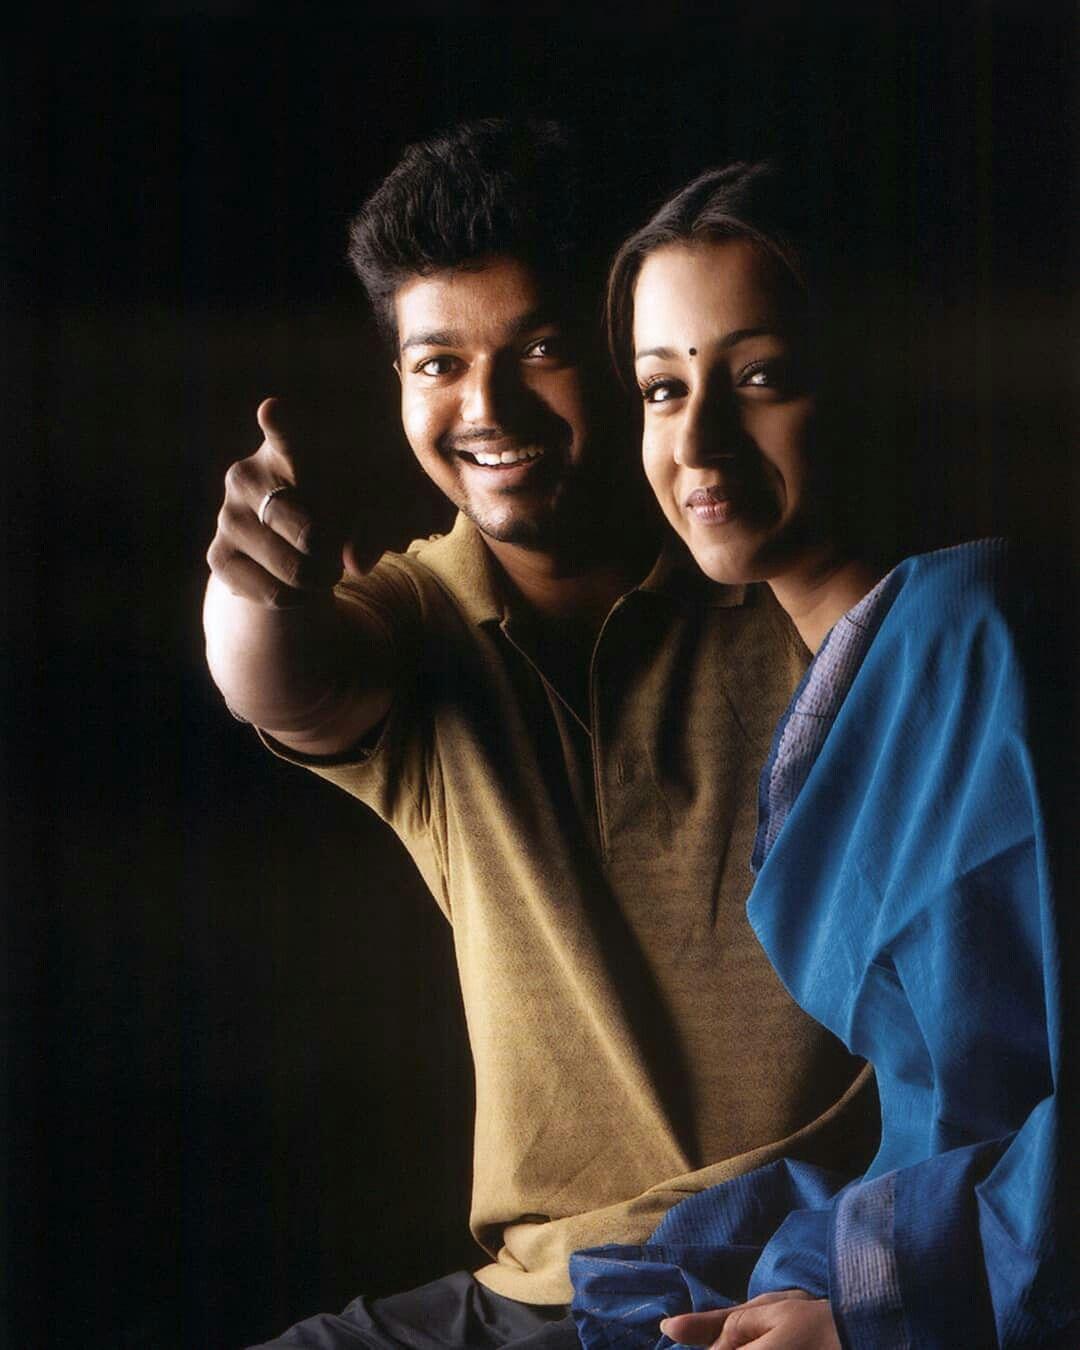 Saravenavelu Cute Actors Love Couple Photo Actor Photo 4k wallpaper gilli hd images